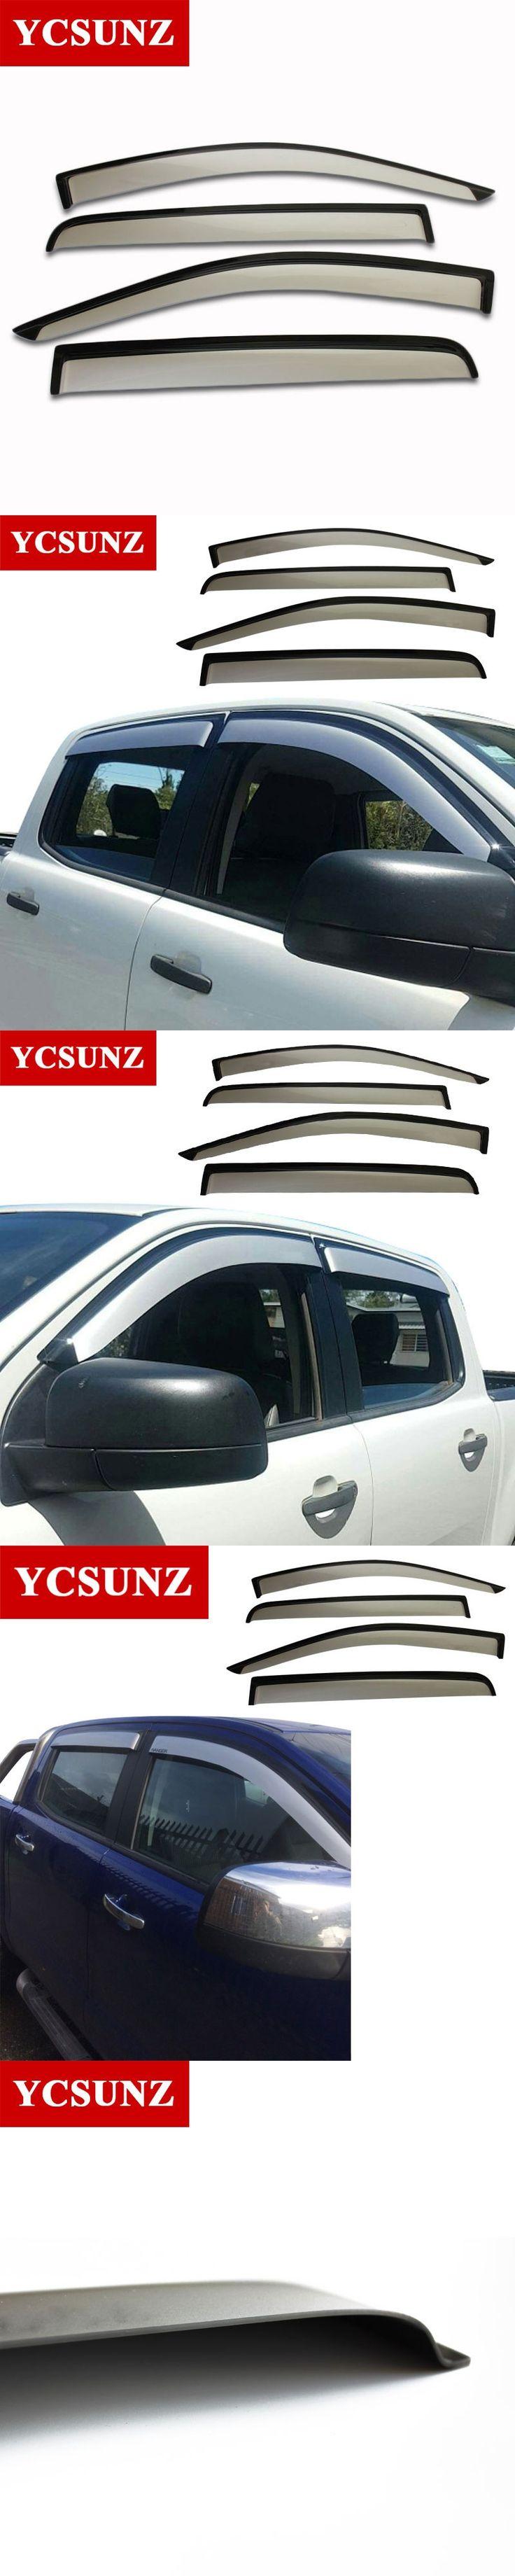 Side Window Deflectors For Ford Ranger Silver Color Car Wind Deflector Sun Guard For Ford Ranger T6 2012-2014 Vent Door Visor